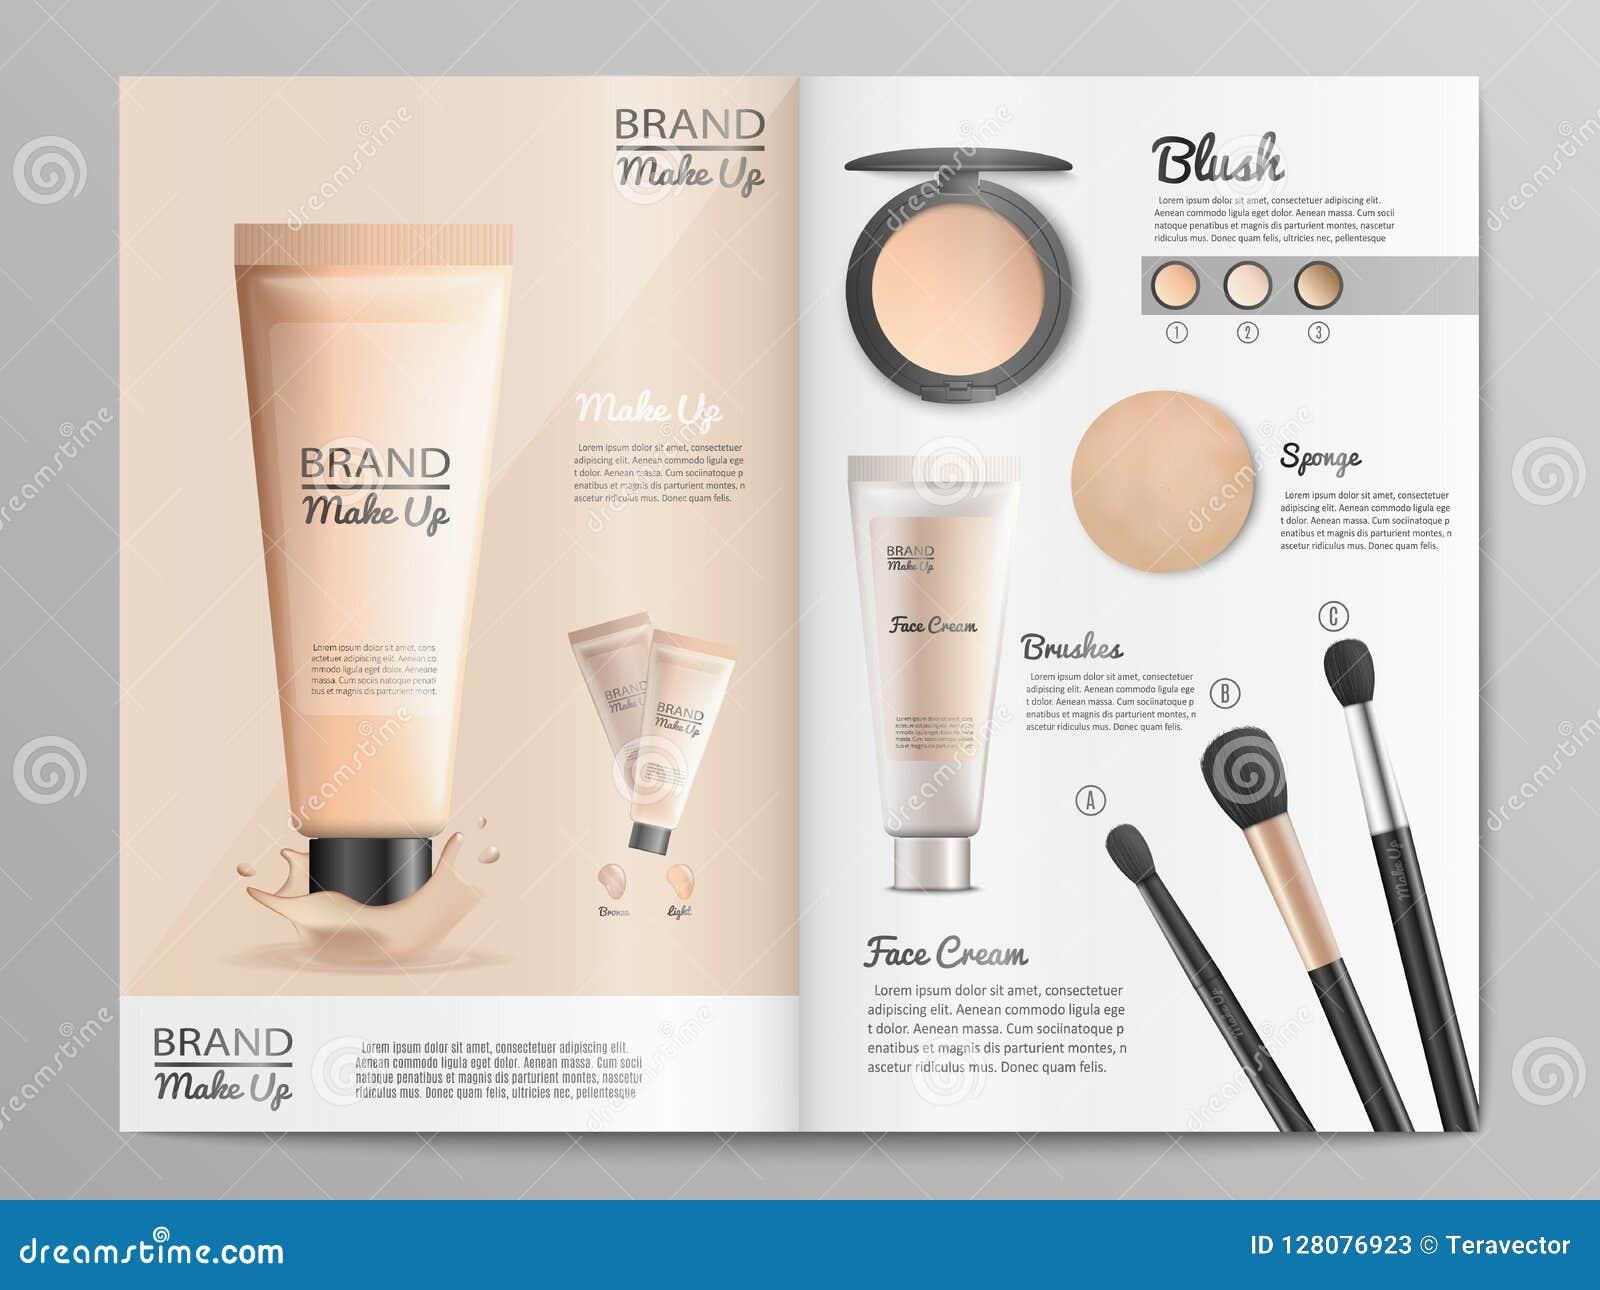 Kosmetik-Produkt-Katalog oder Broschüren-Schablone